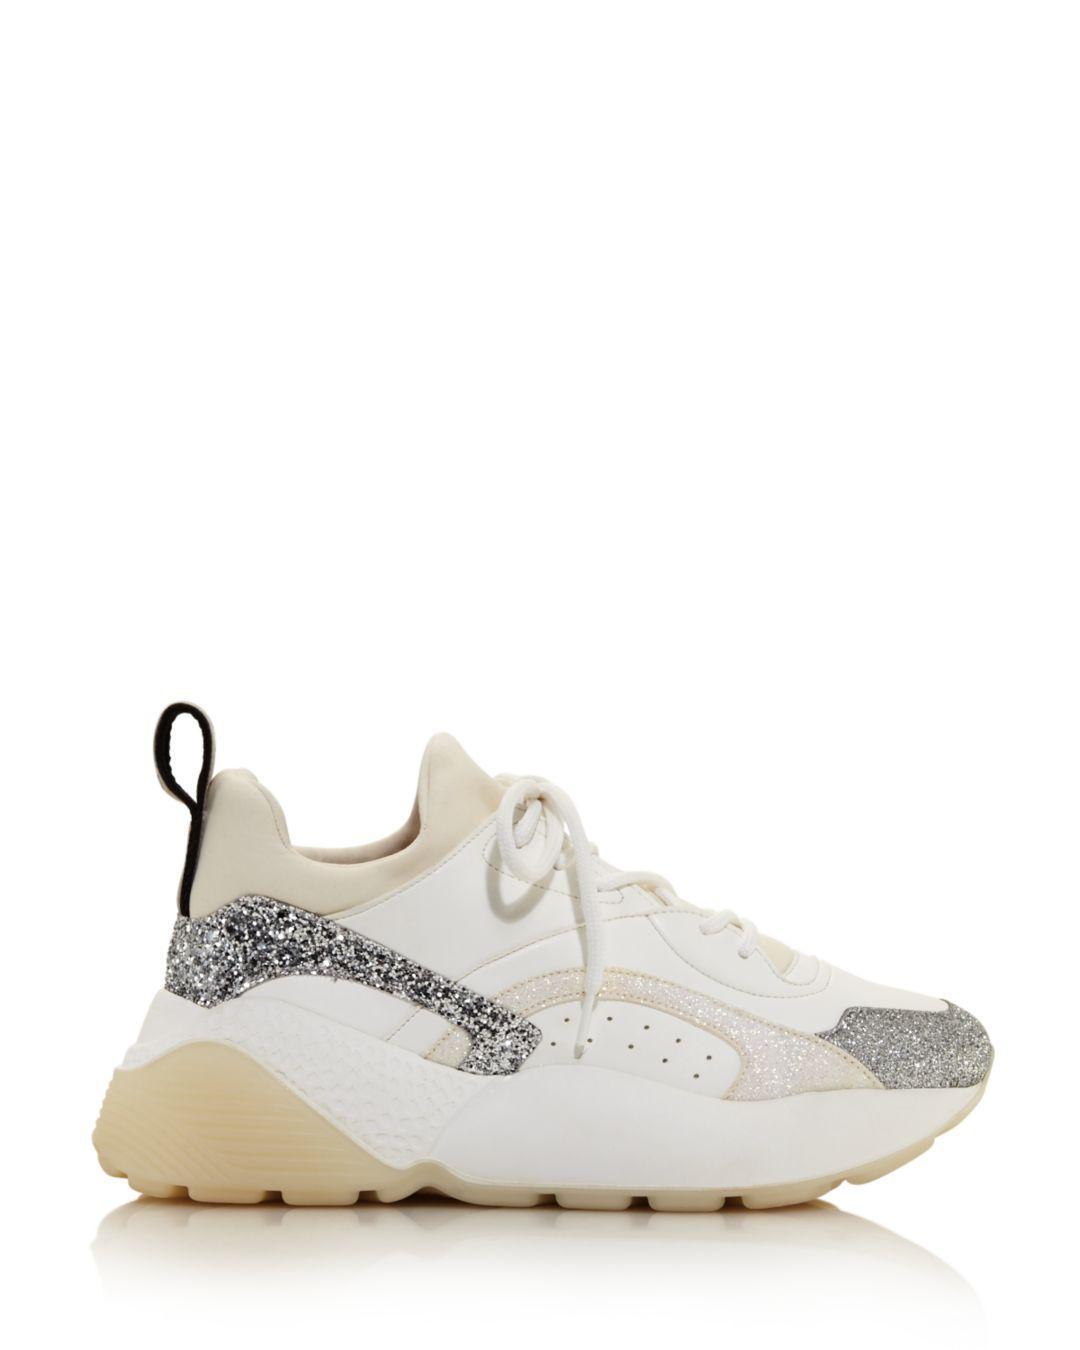 Eclypse Dad Sneakers - Lyst